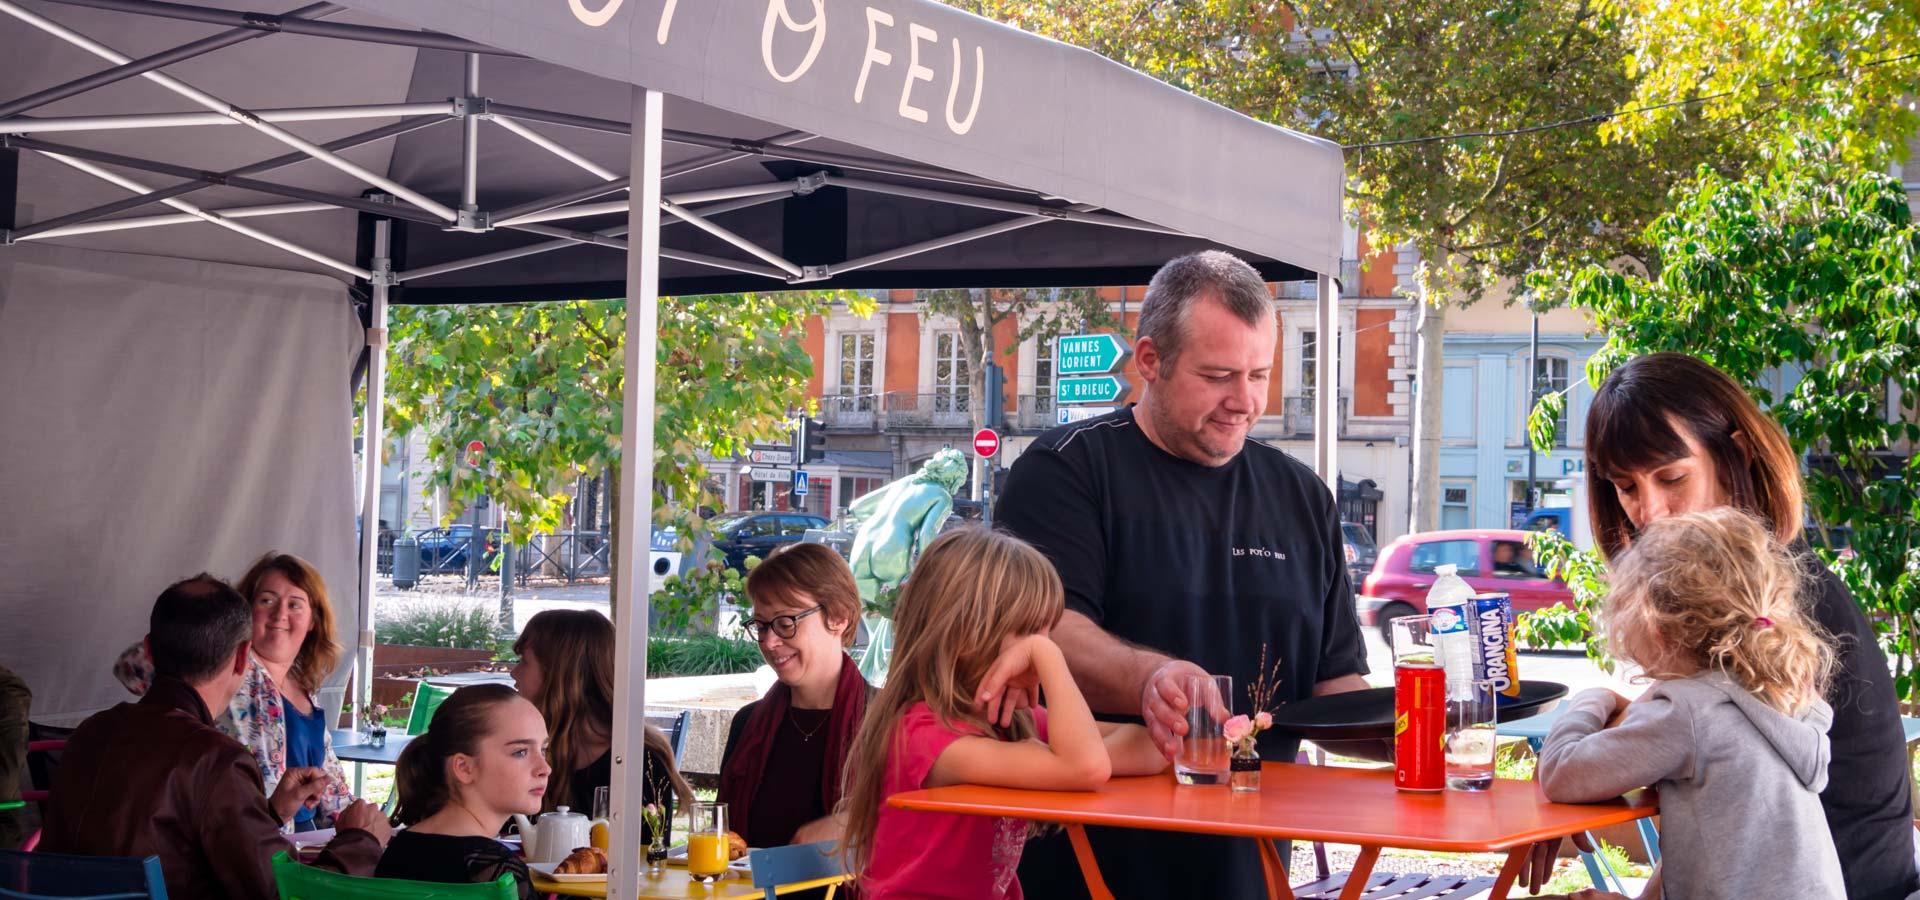 terrasse-restaurant-potofeu-rennes